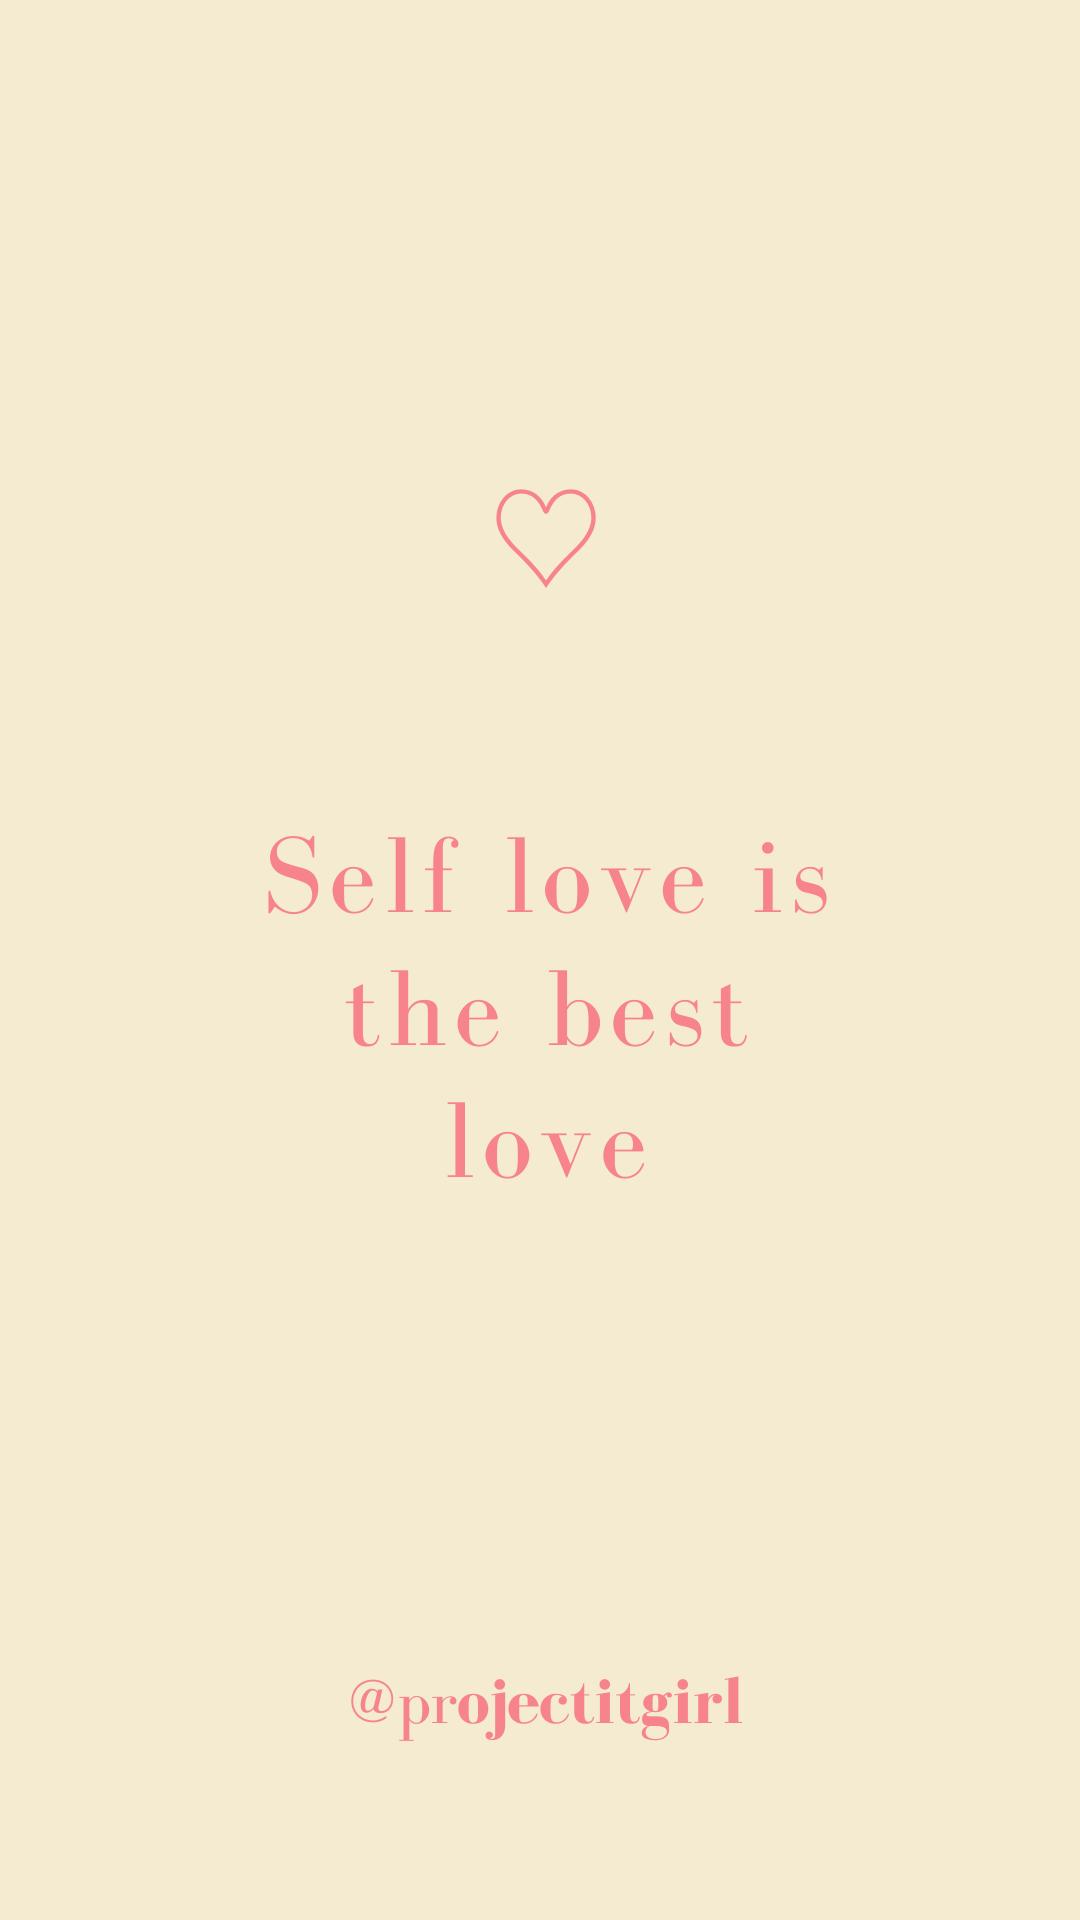 quotes | wellness | inspiration | lockscreens